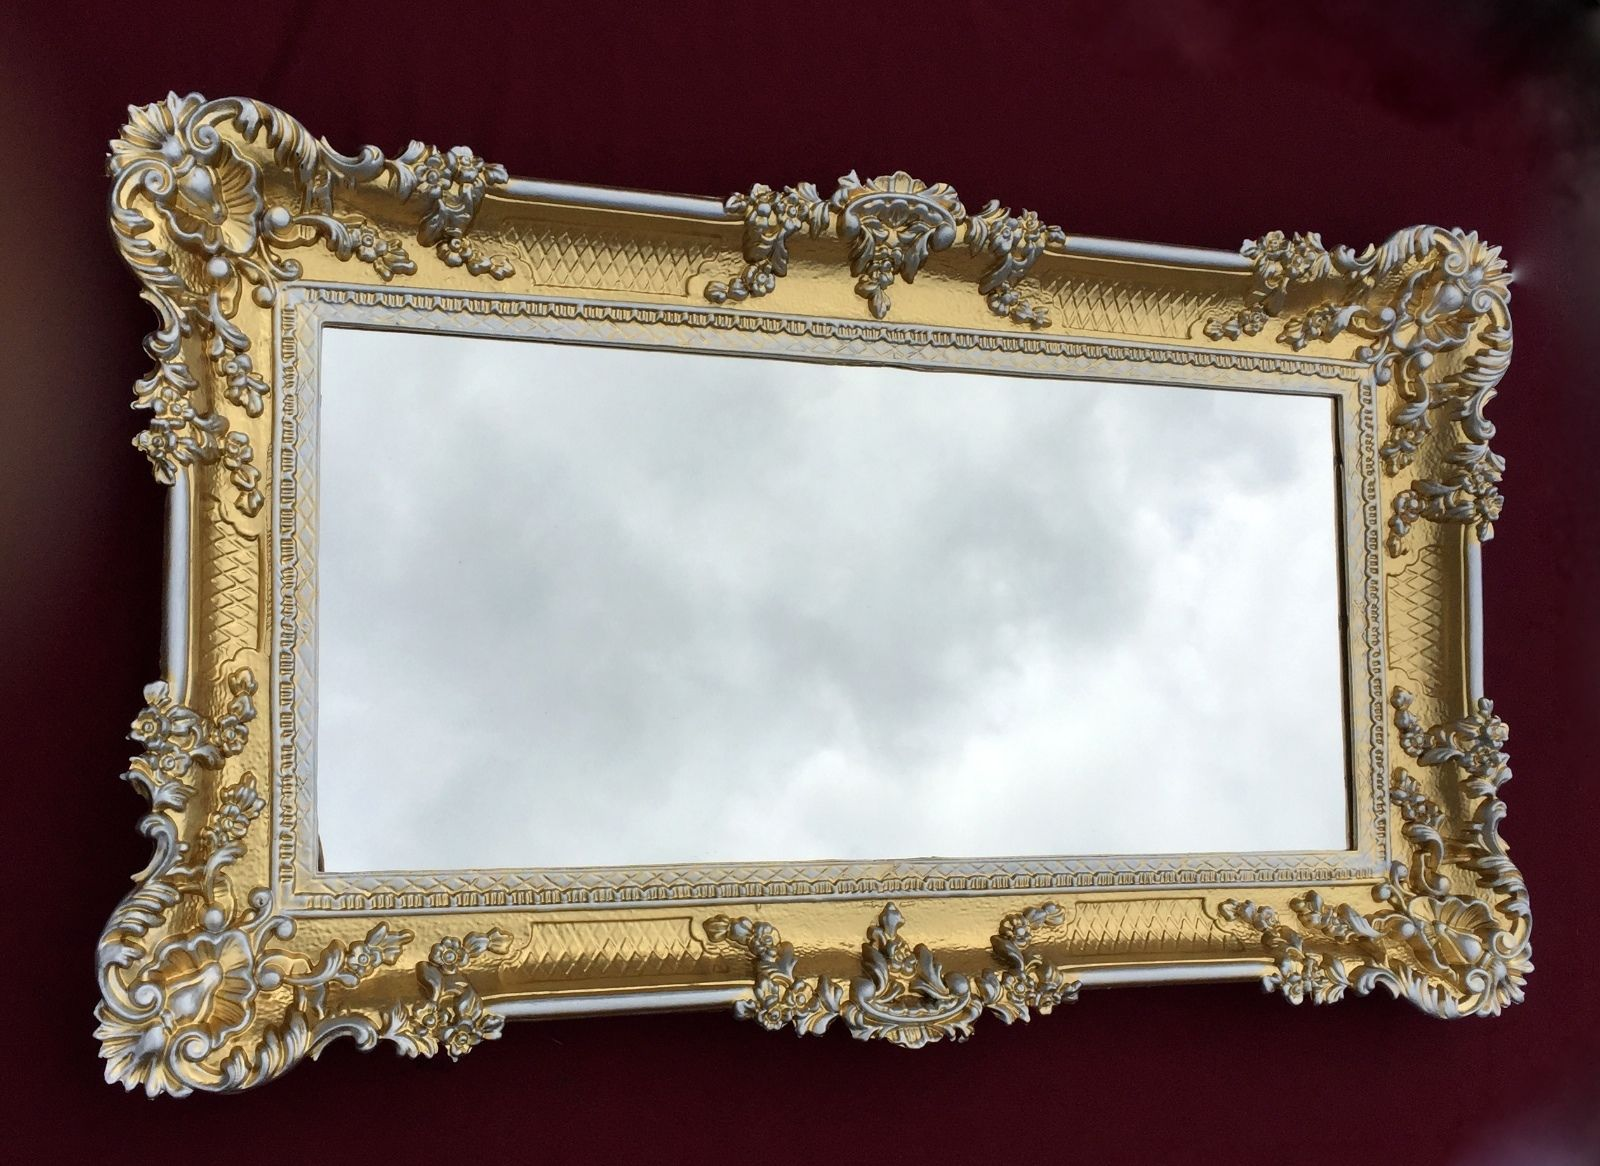 wandspiegel barock gold silber spiegel antik 97x57 badspiegel rechteckig 3074 kaufen bei. Black Bedroom Furniture Sets. Home Design Ideas